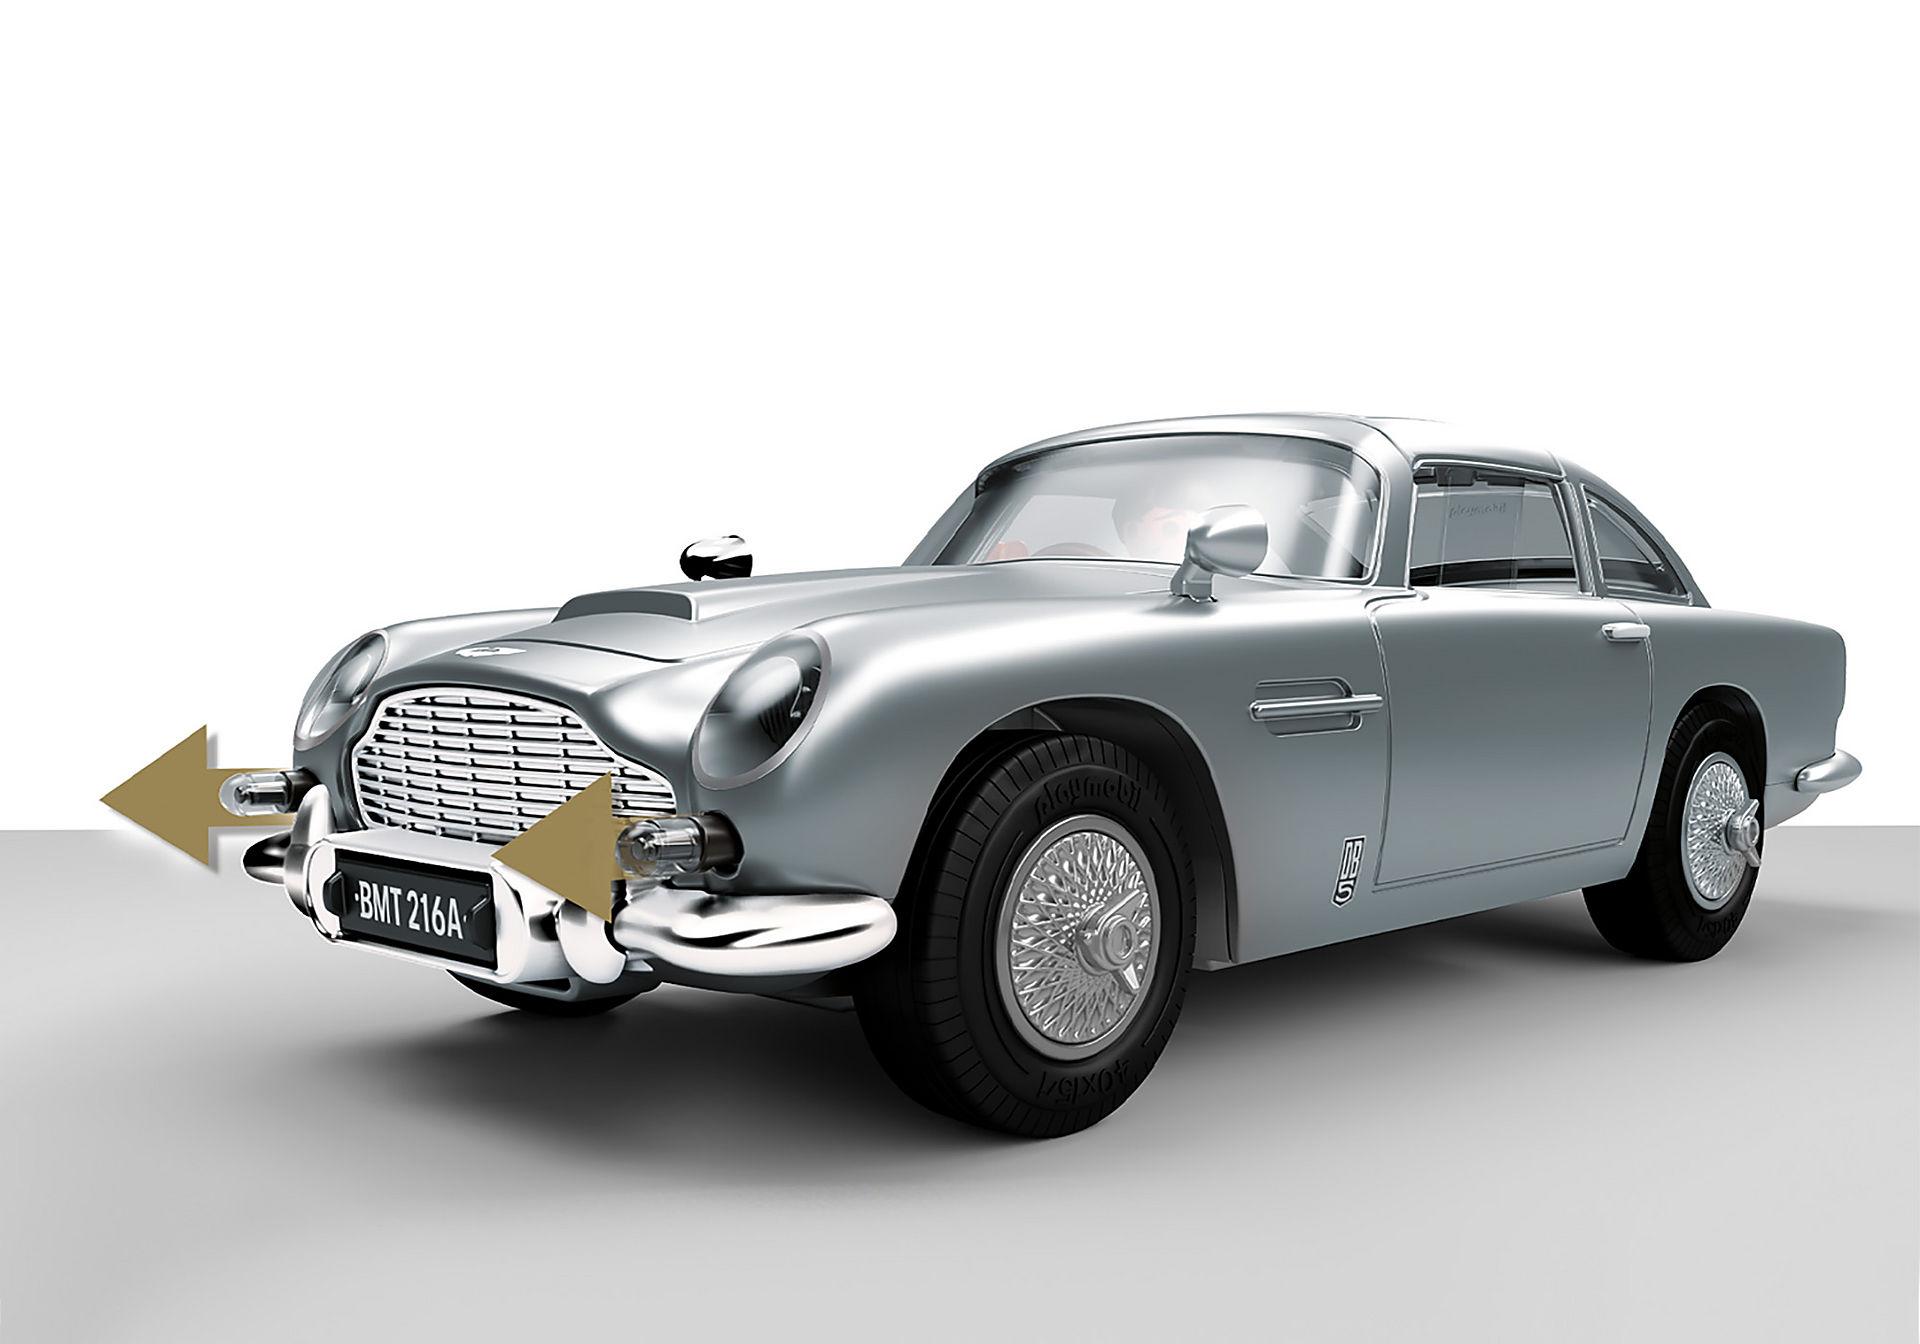 70578 James Bond Aston Martin DB5 - Goldfinger Edition zoom image5